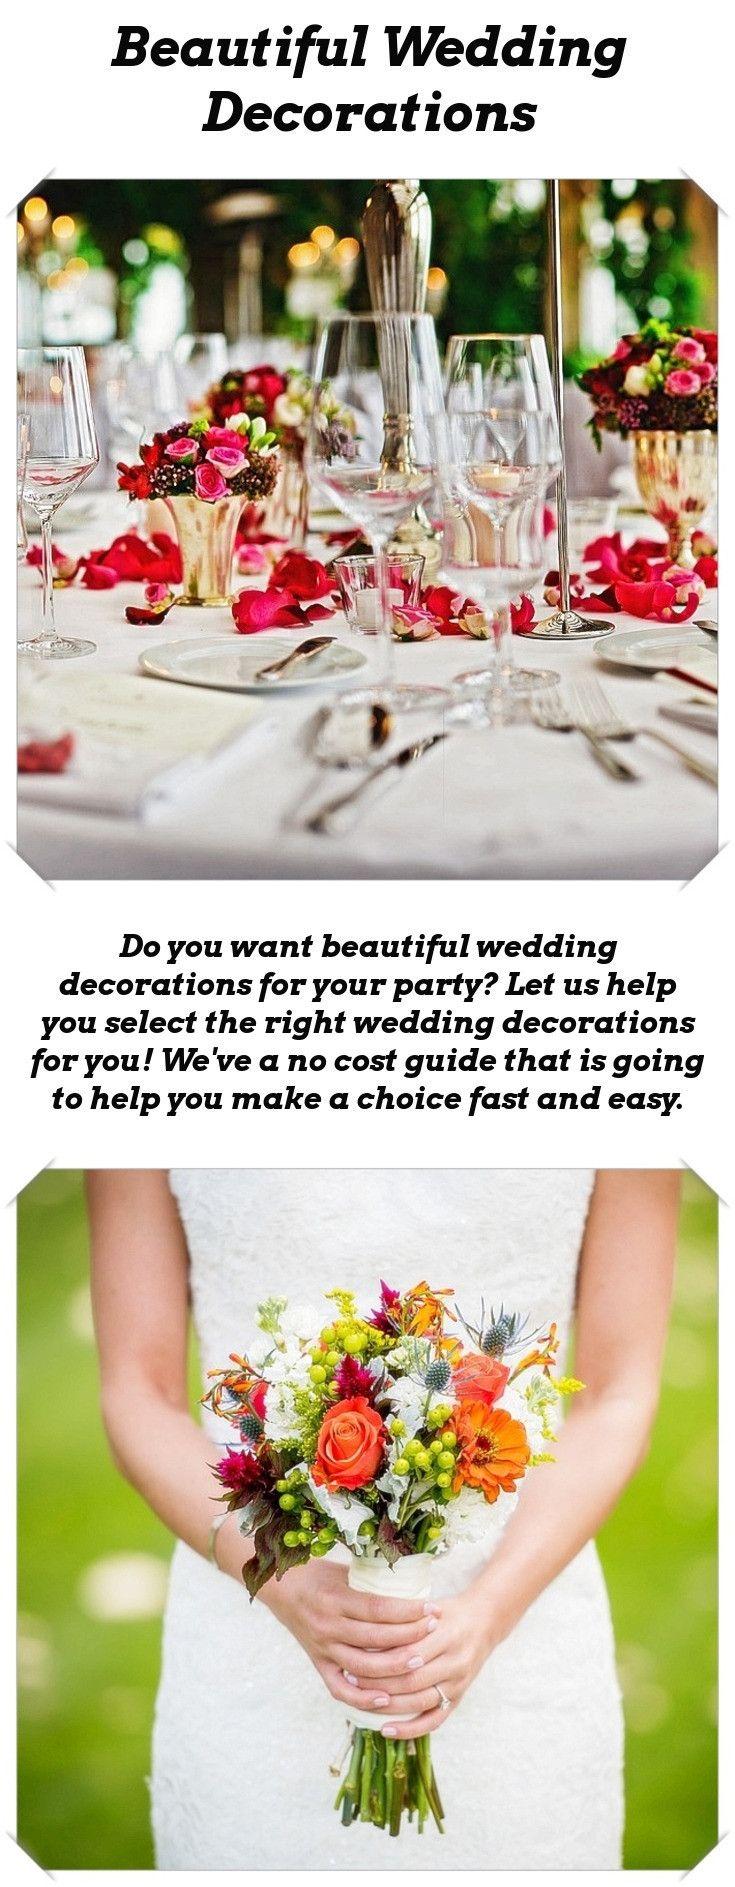 Wedding decoration ideas wedding receptions pinterest wedding